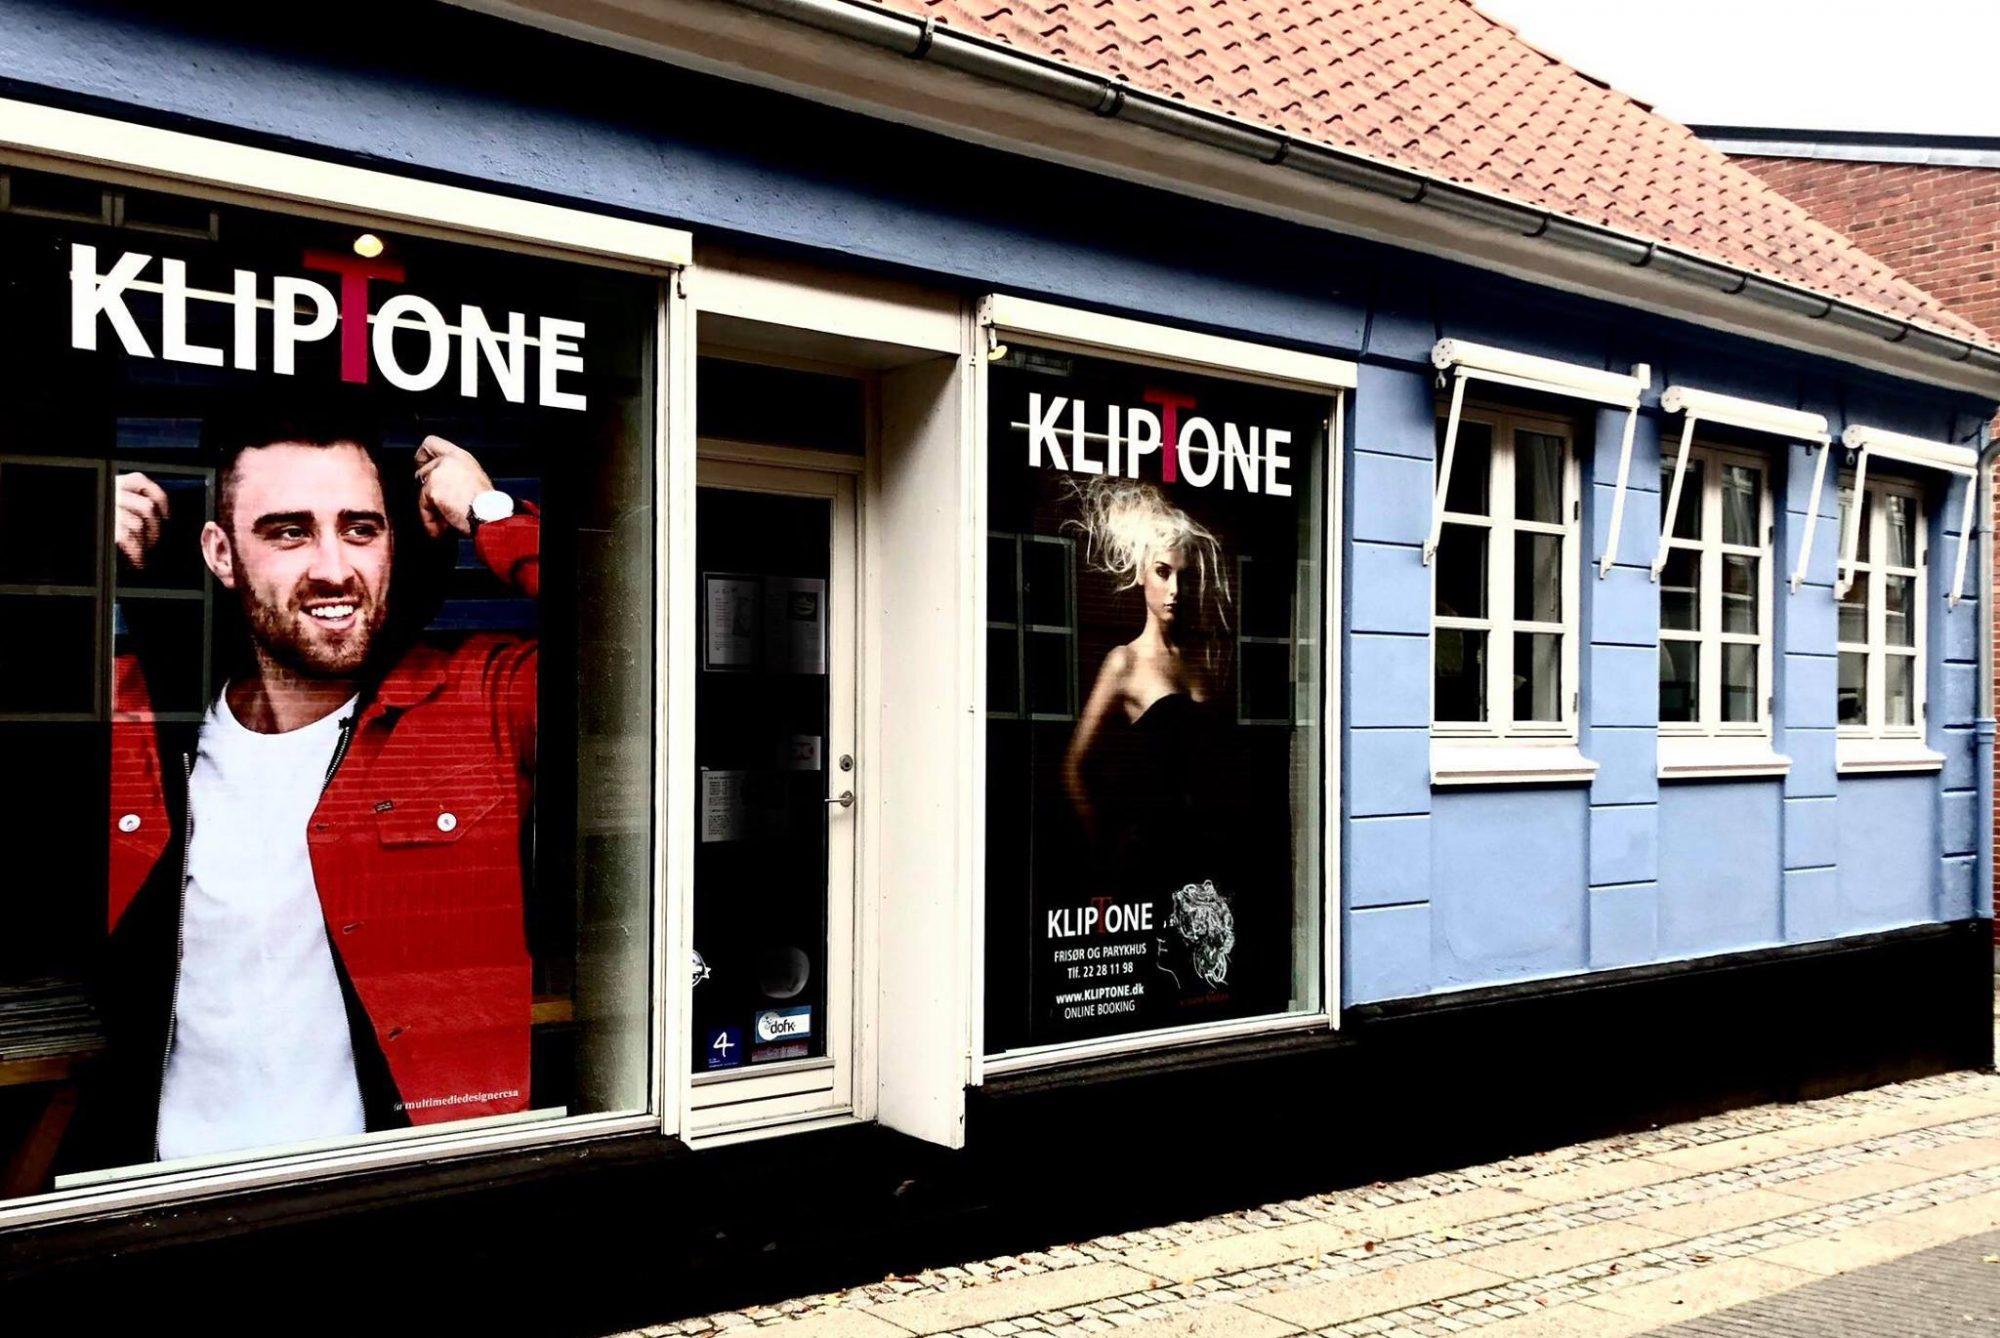 KLIPTONE  FRISØR OG PARYKHUS - VESTERGADE 6 7800 SKIVE - 22 28 11 98